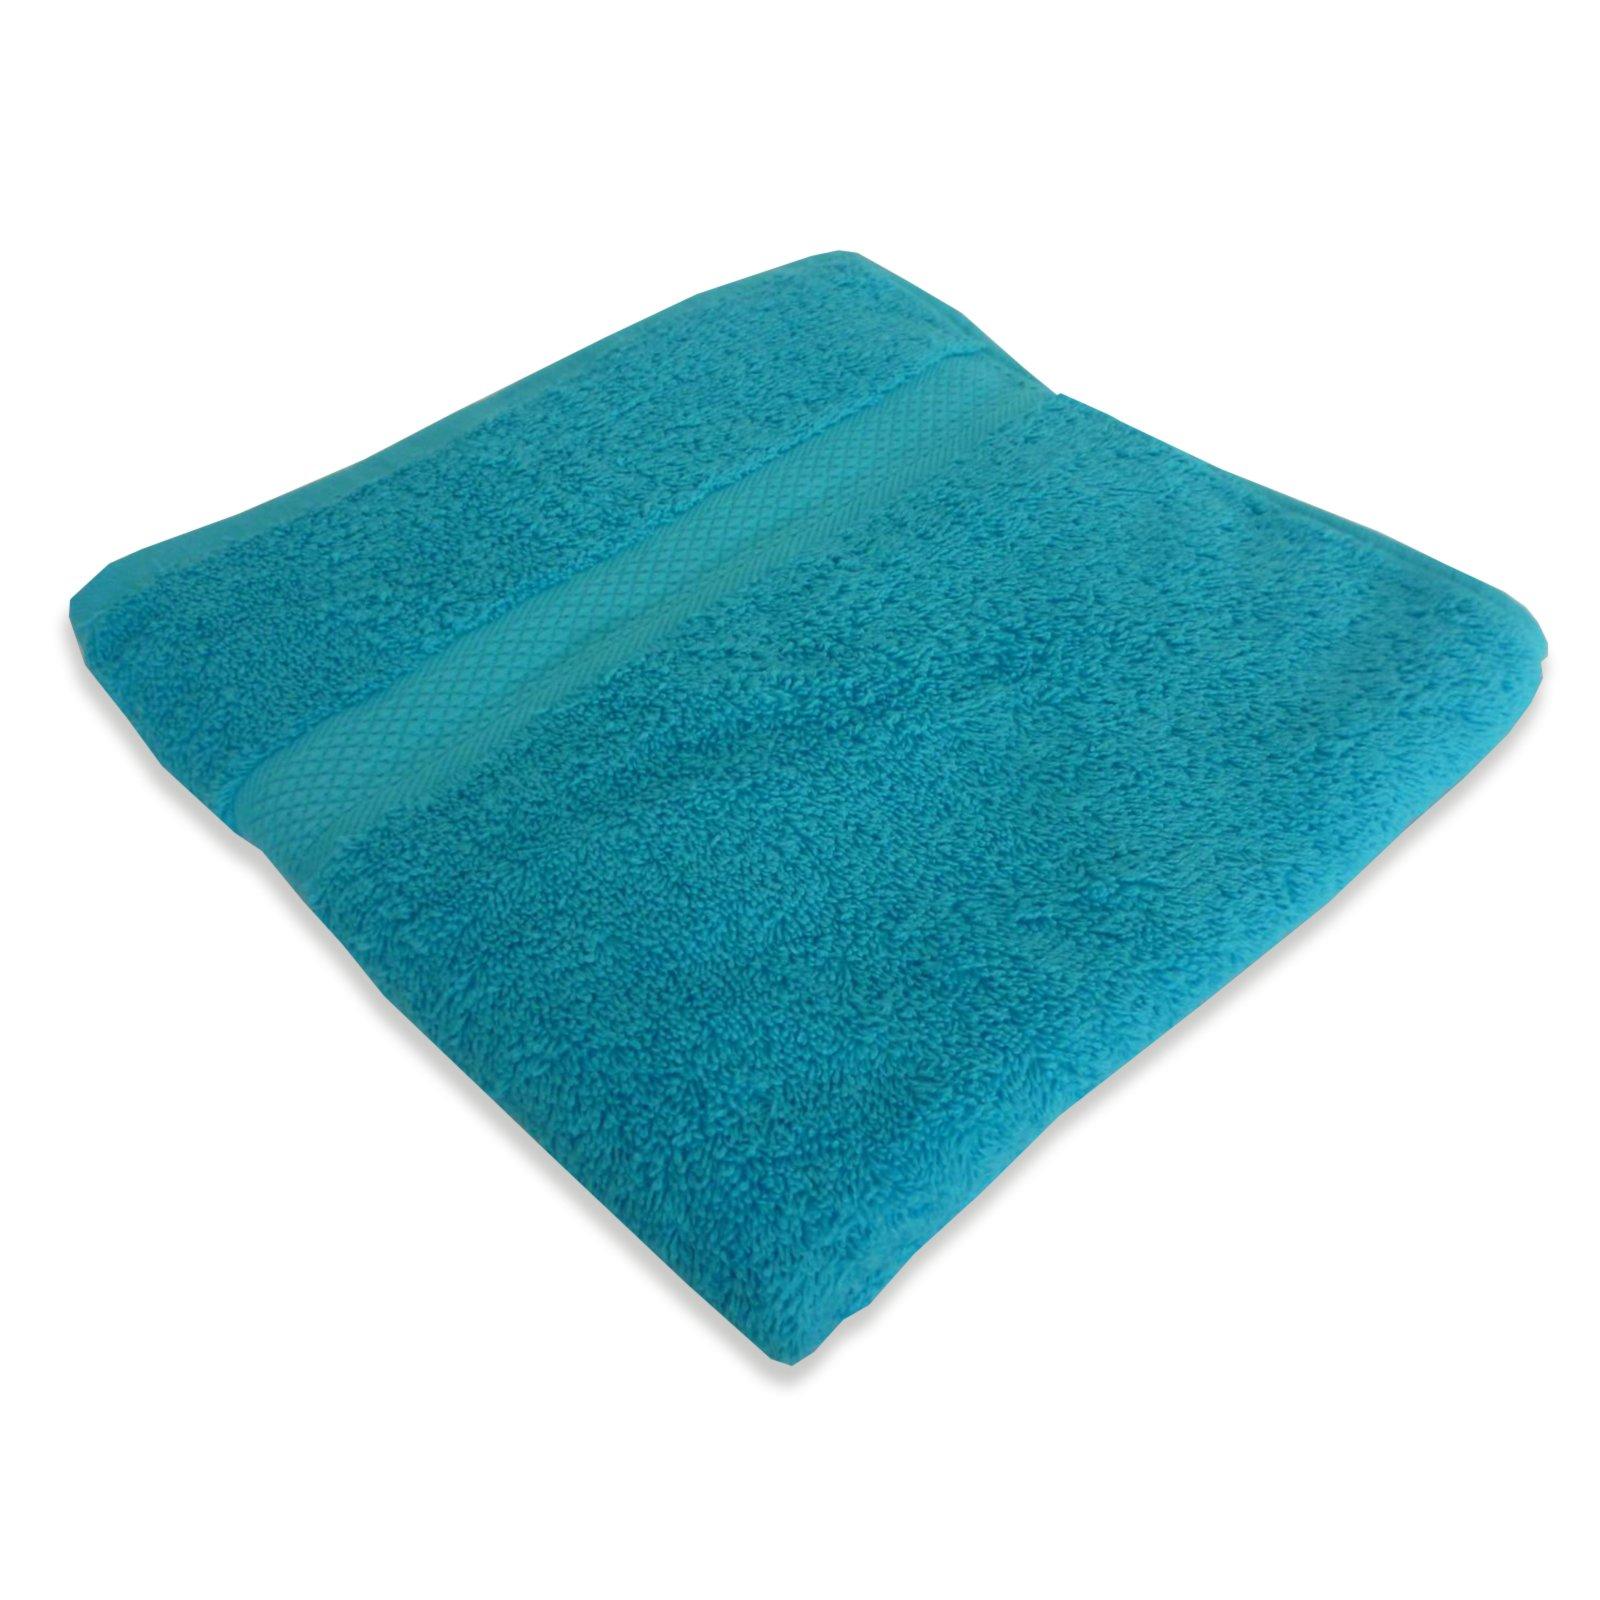 handtuch premium t rkis 50x100 cm handt cher badtextilien bad accessoires deko. Black Bedroom Furniture Sets. Home Design Ideas